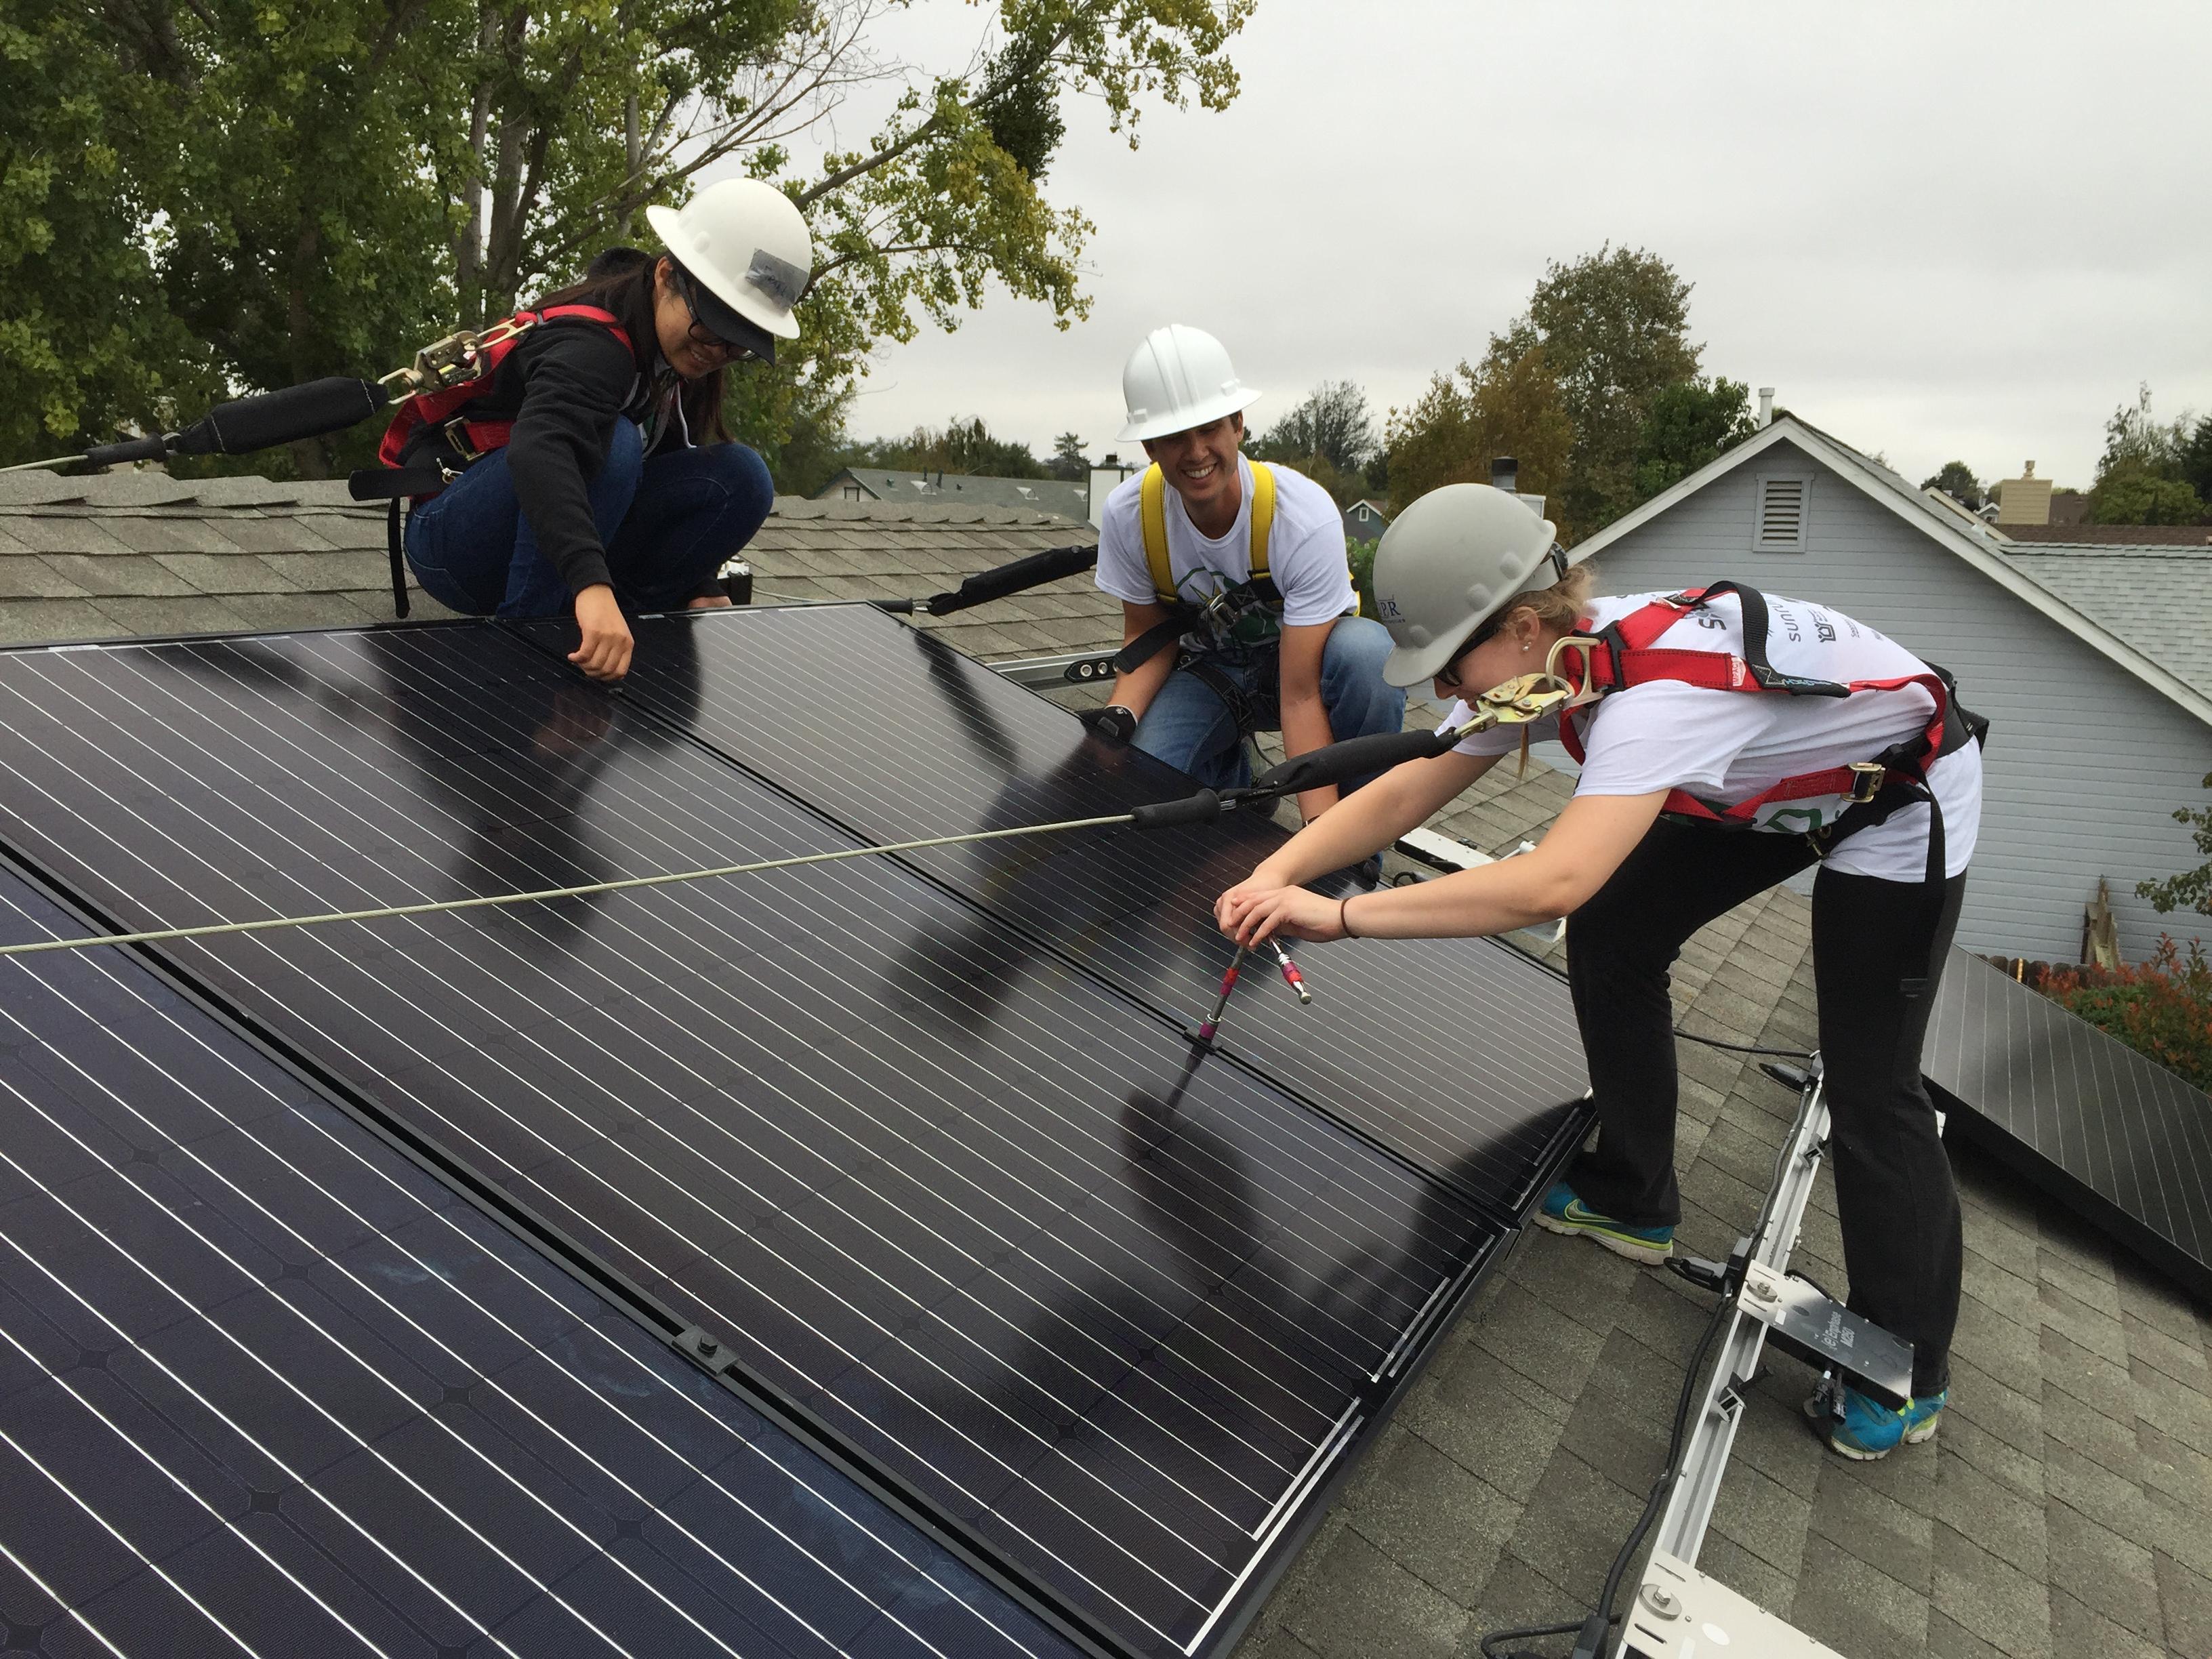 Solarthon 2015